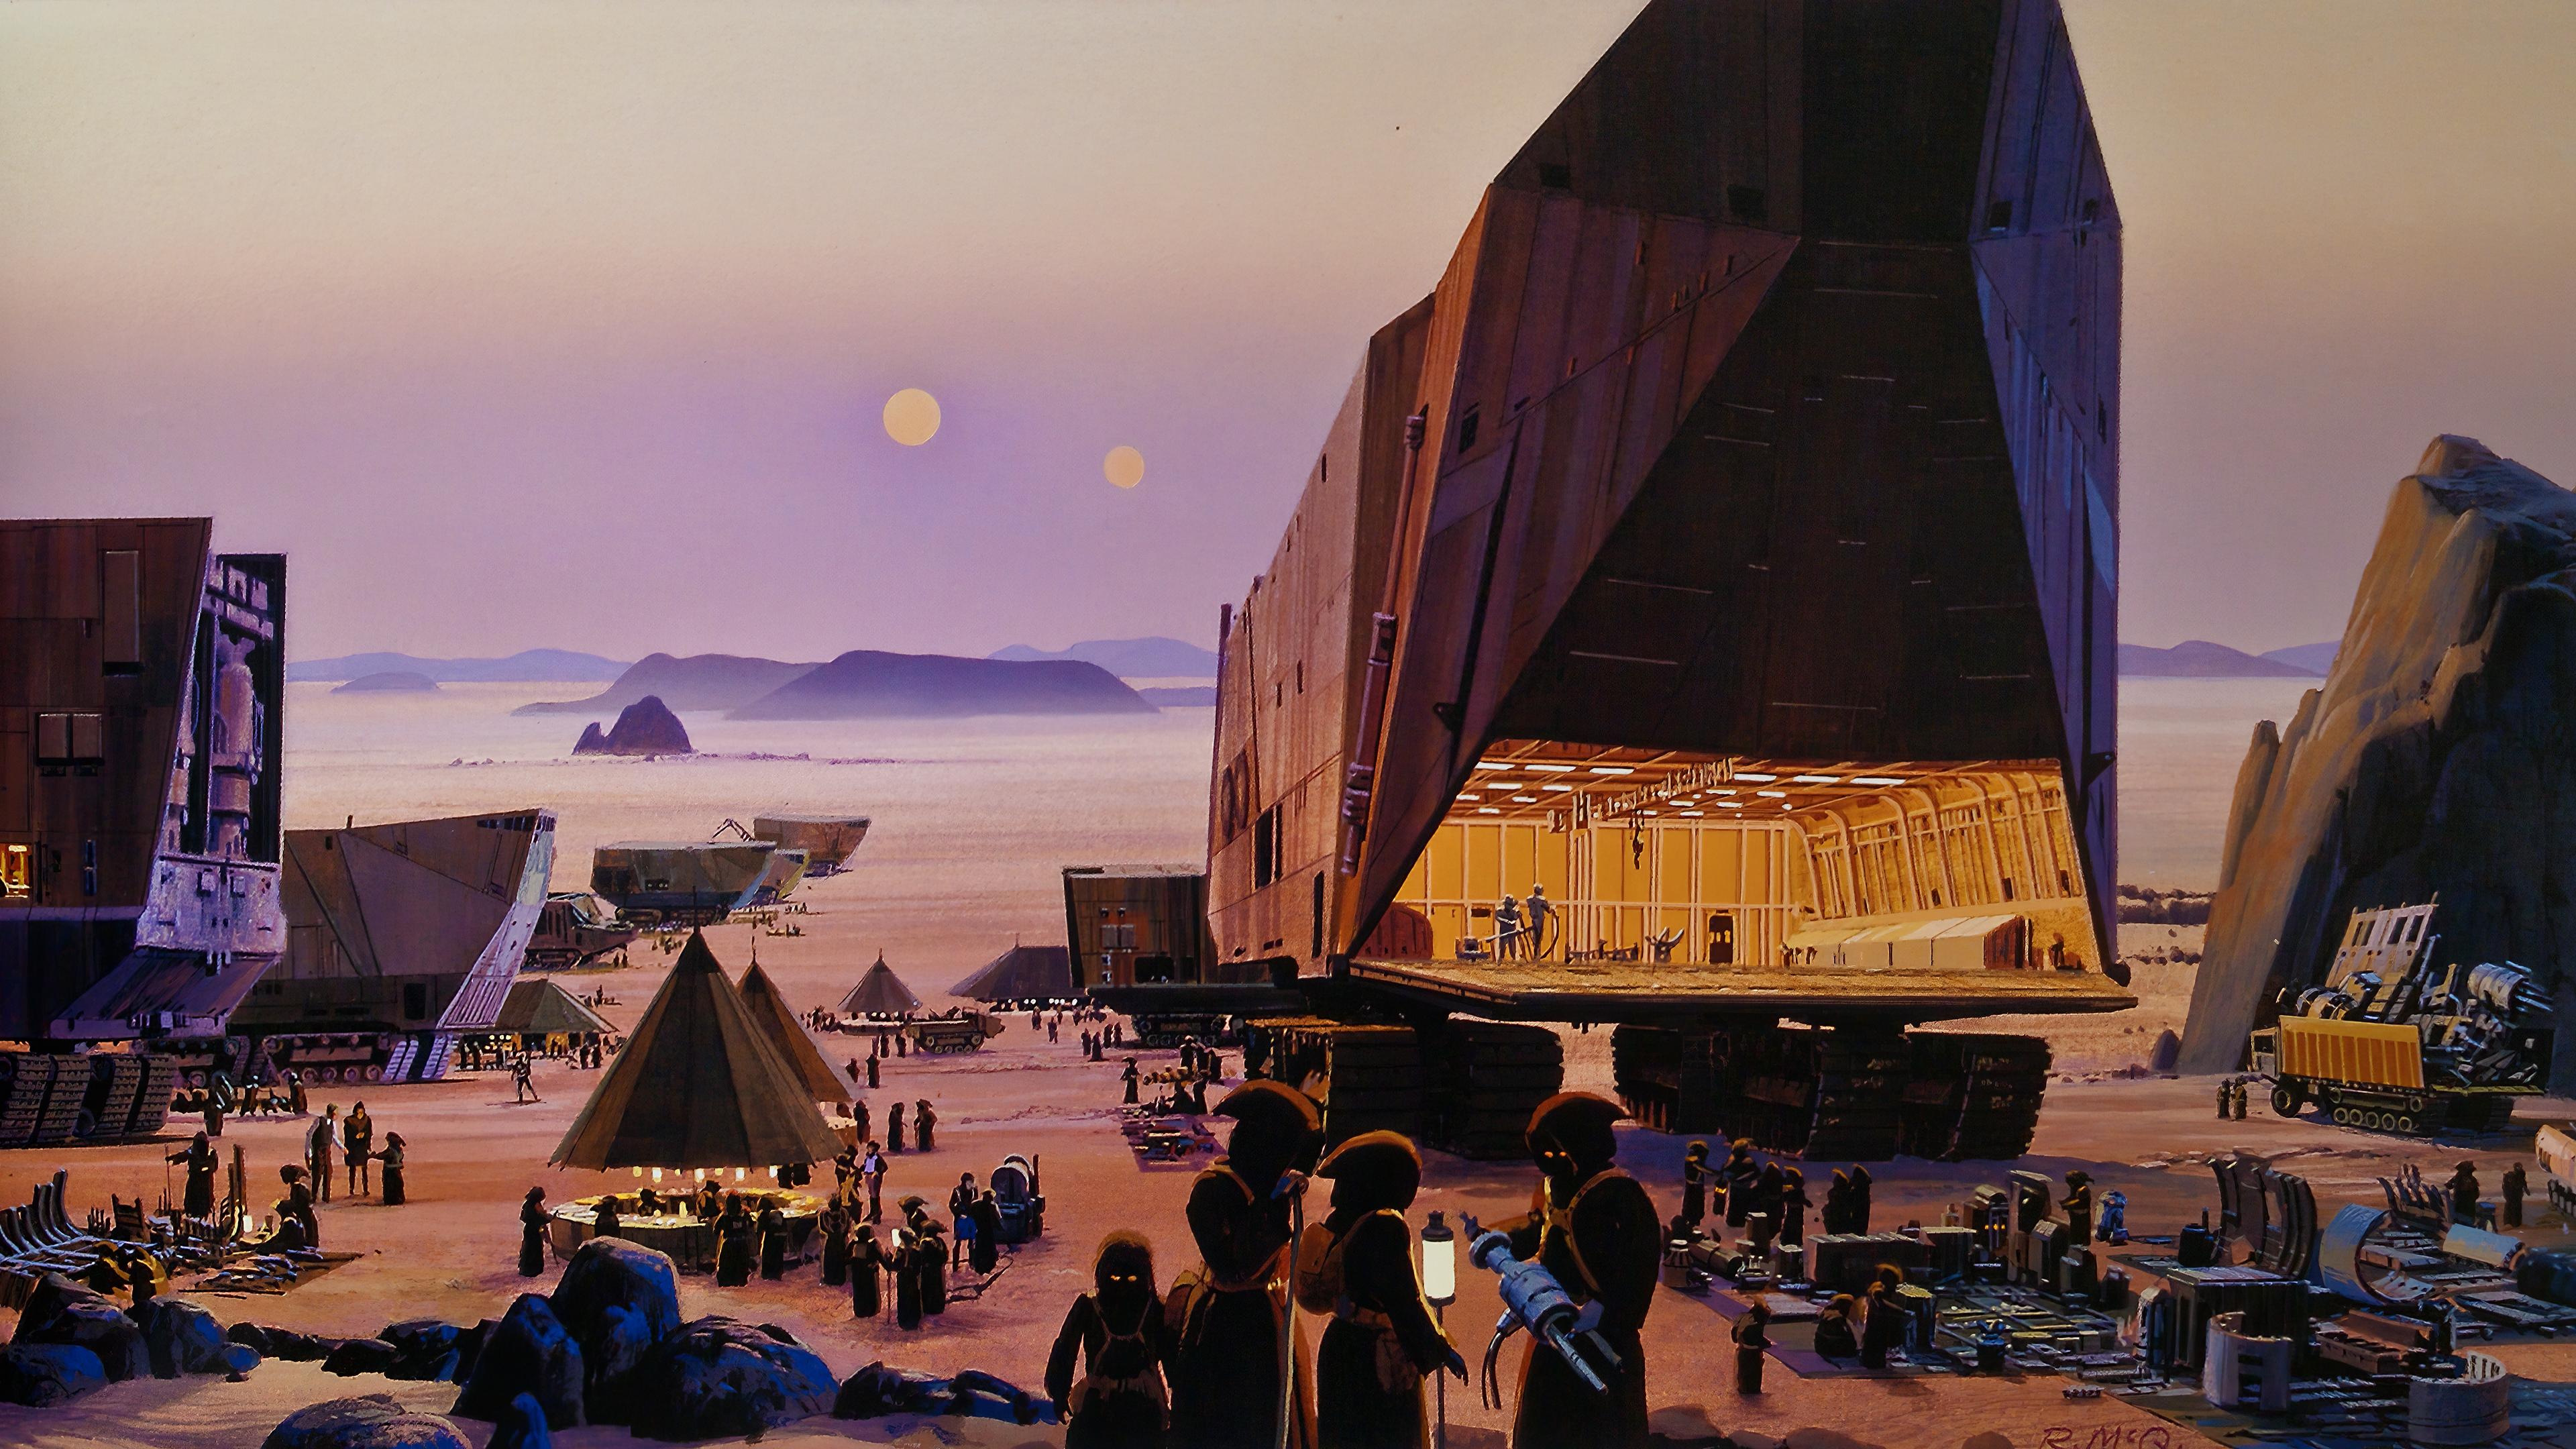 General 3840x2160 Star Wars cargo Jawas desert digital art parts Ralph McQuarrie